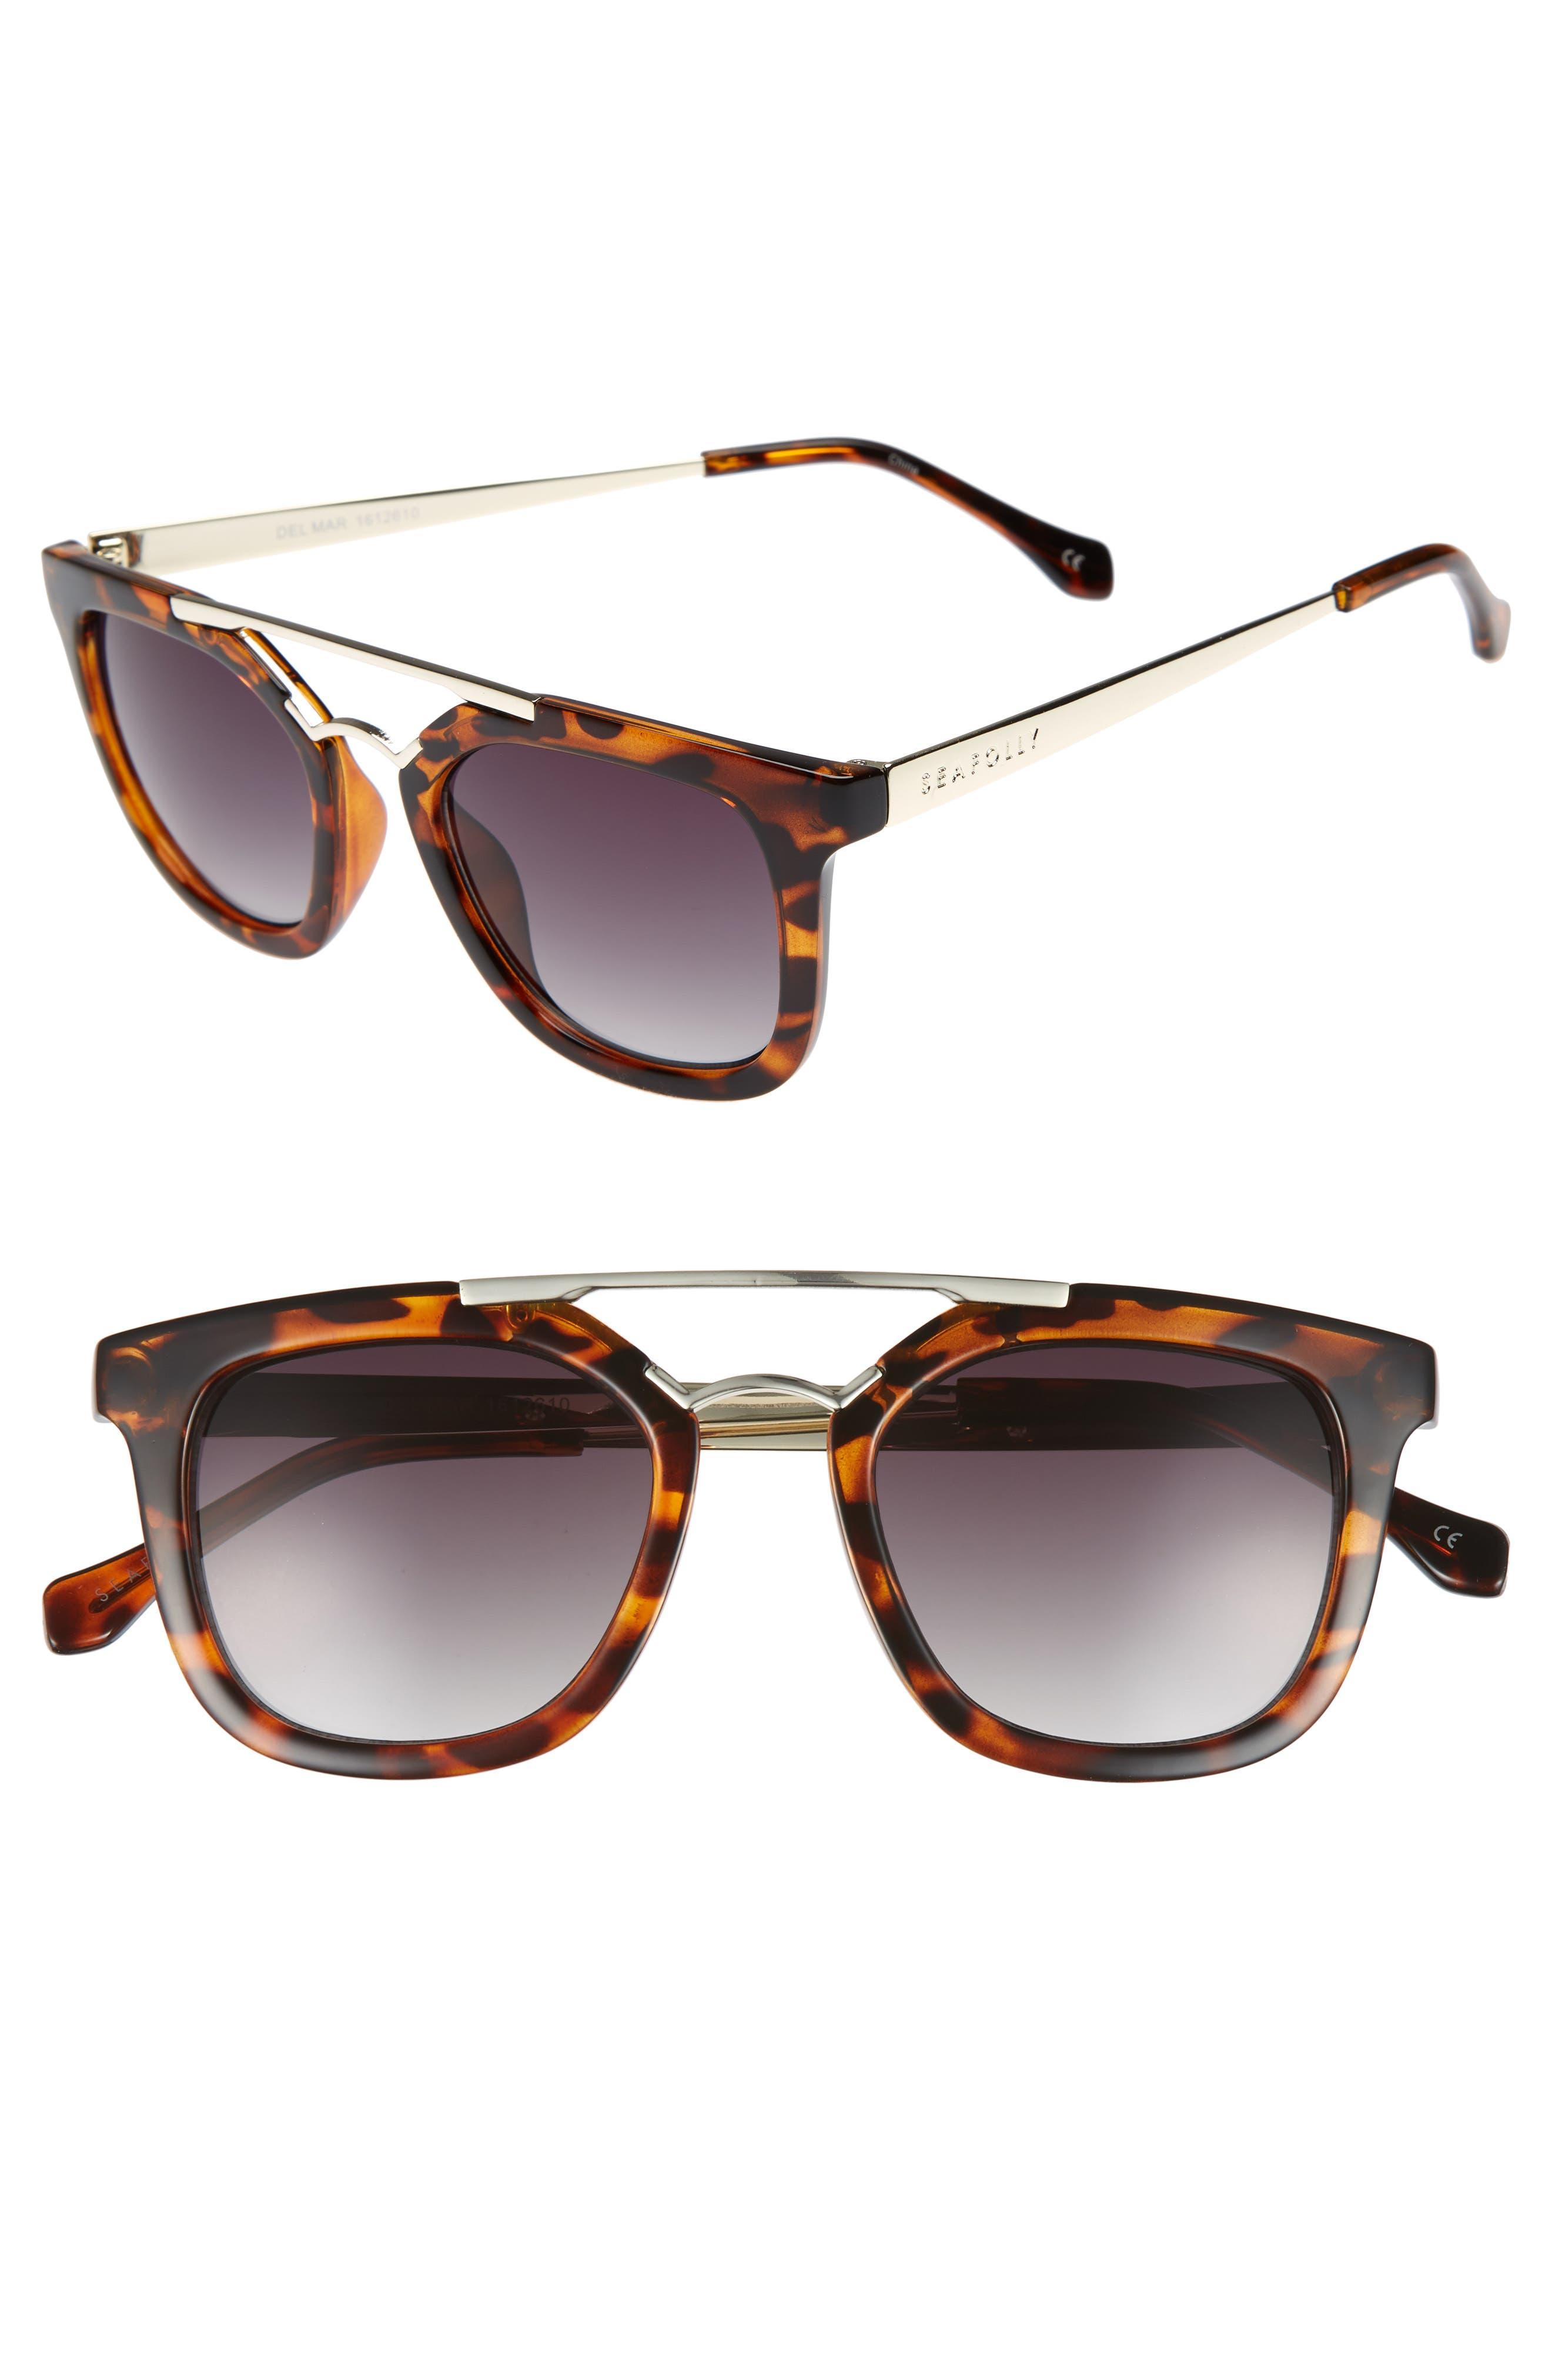 Del Mar 49mm Tortiseshell Aviator Sunglasses,                         Main,                         color, DARK TORT